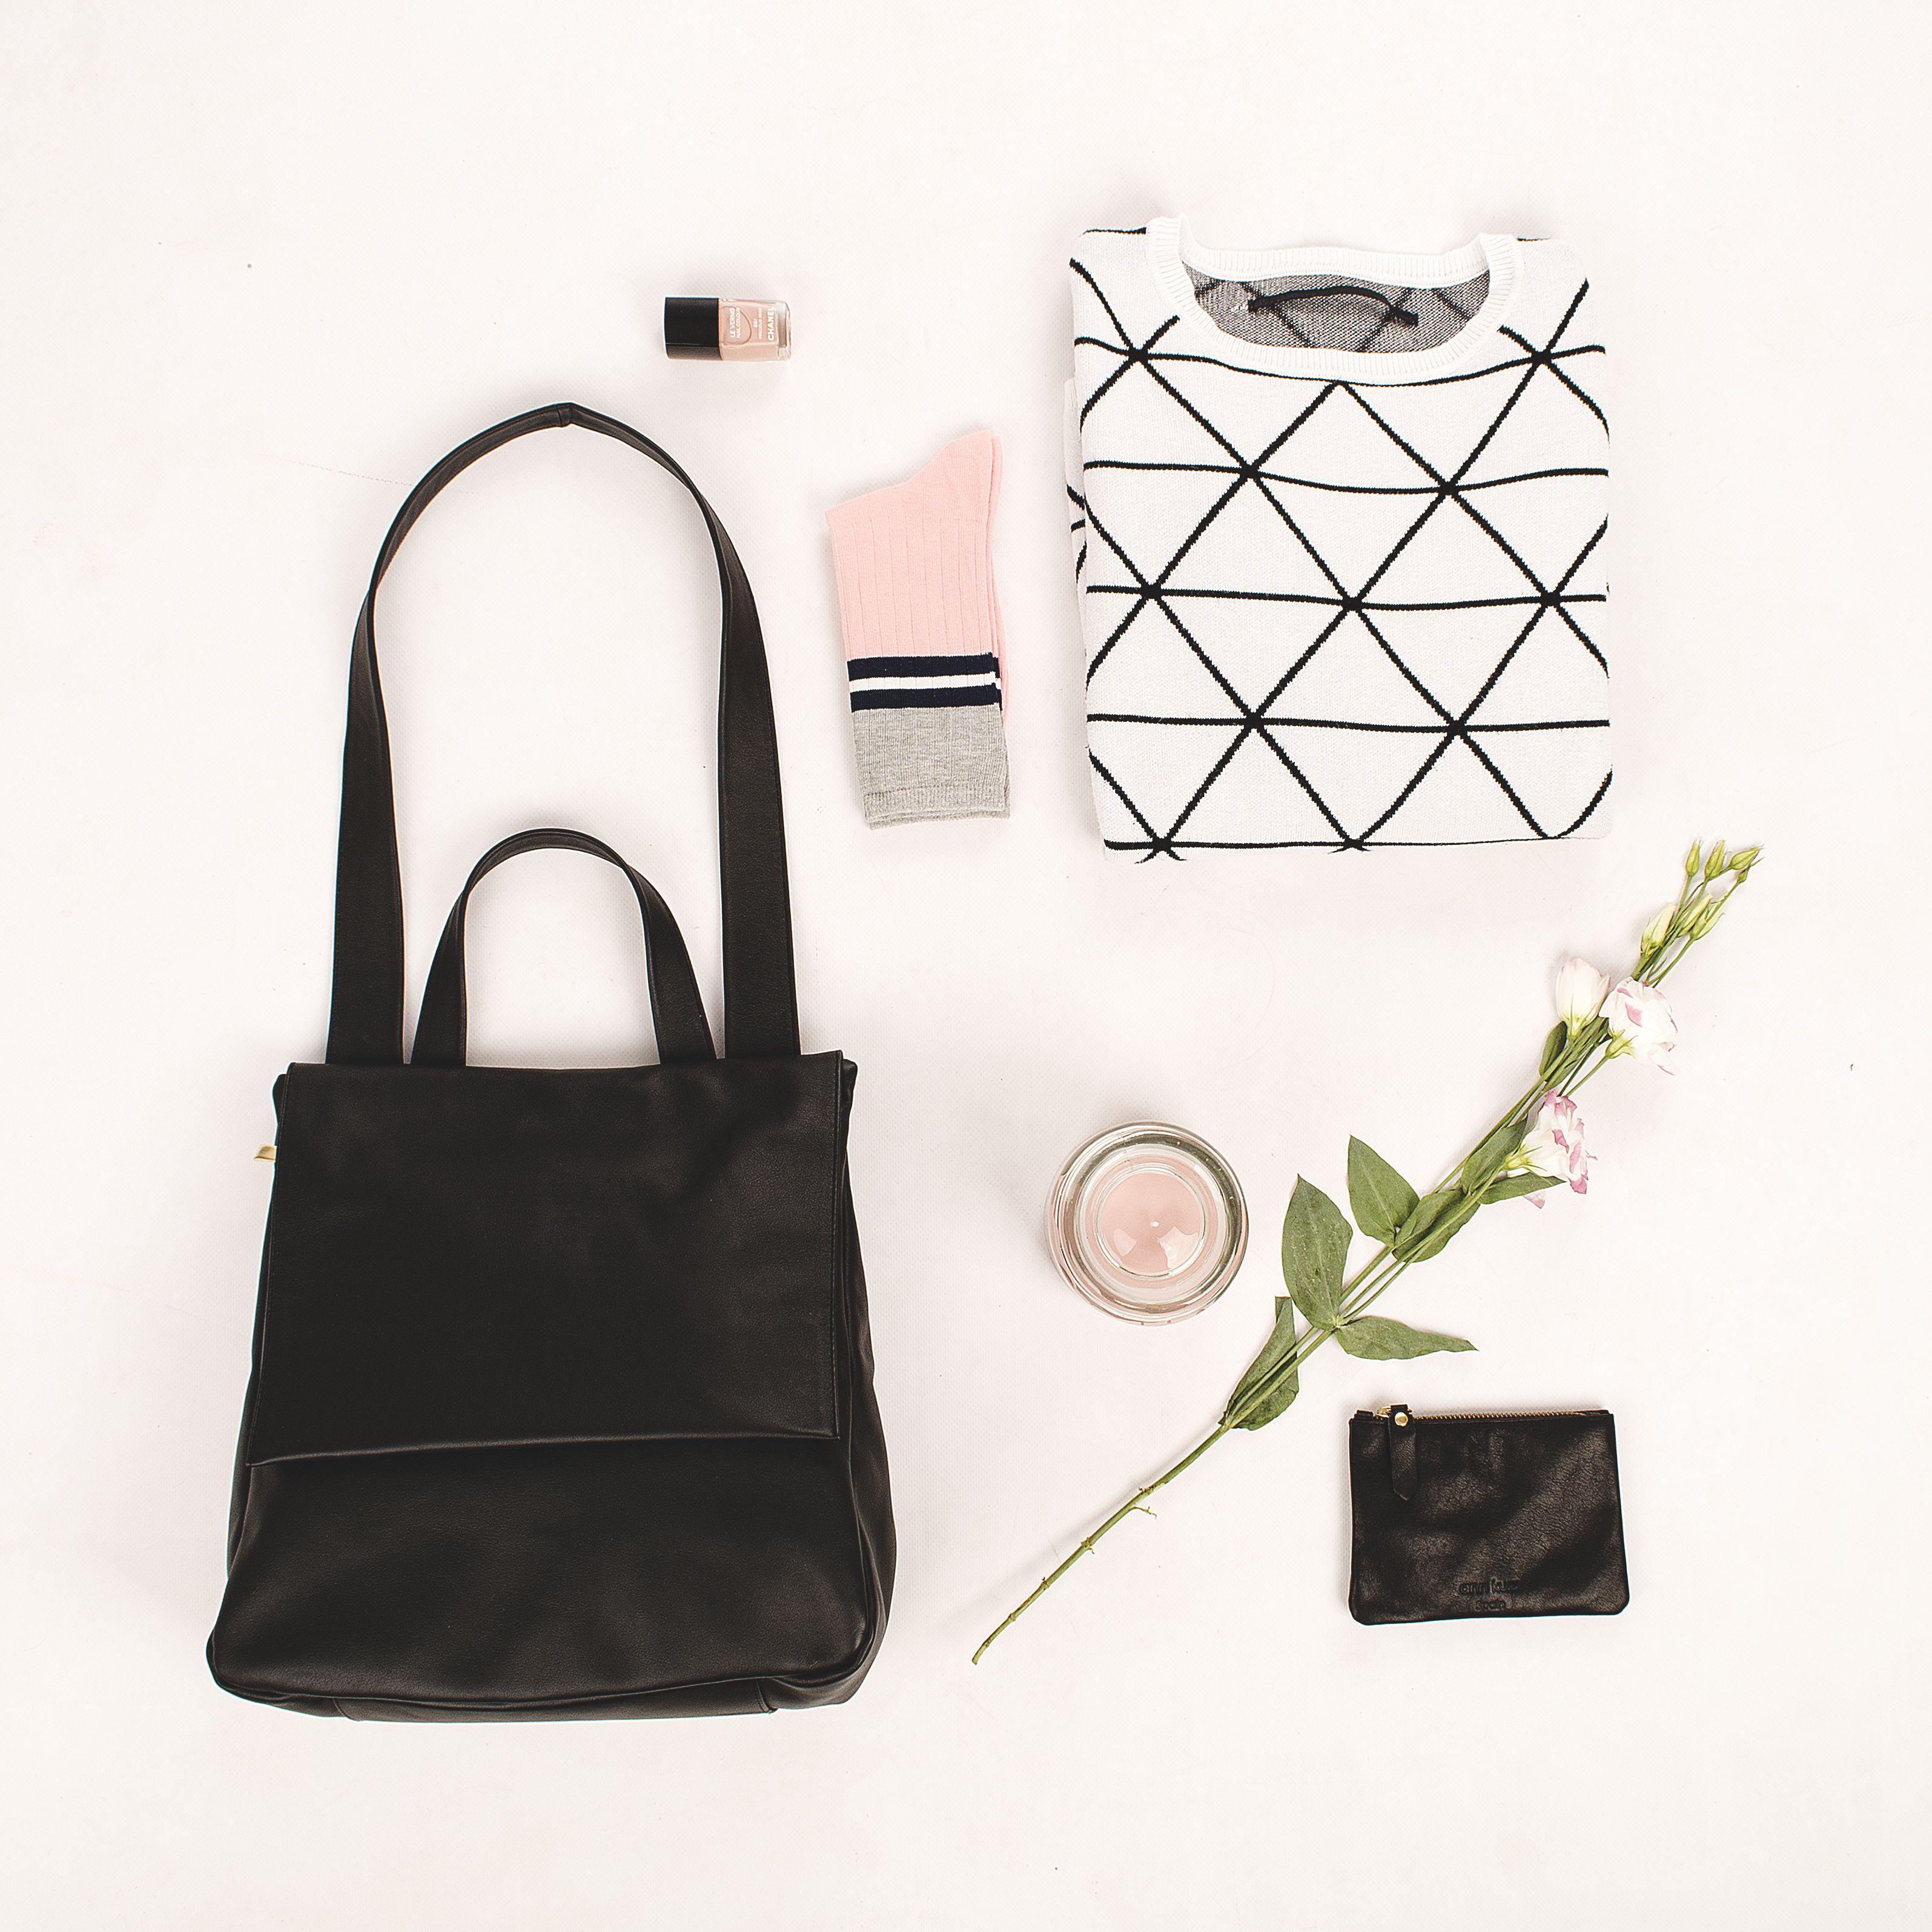 BLACK METROPOLITAN - BLACK PURSY #purse #flowers #candle #socks #nailpolish #sweater